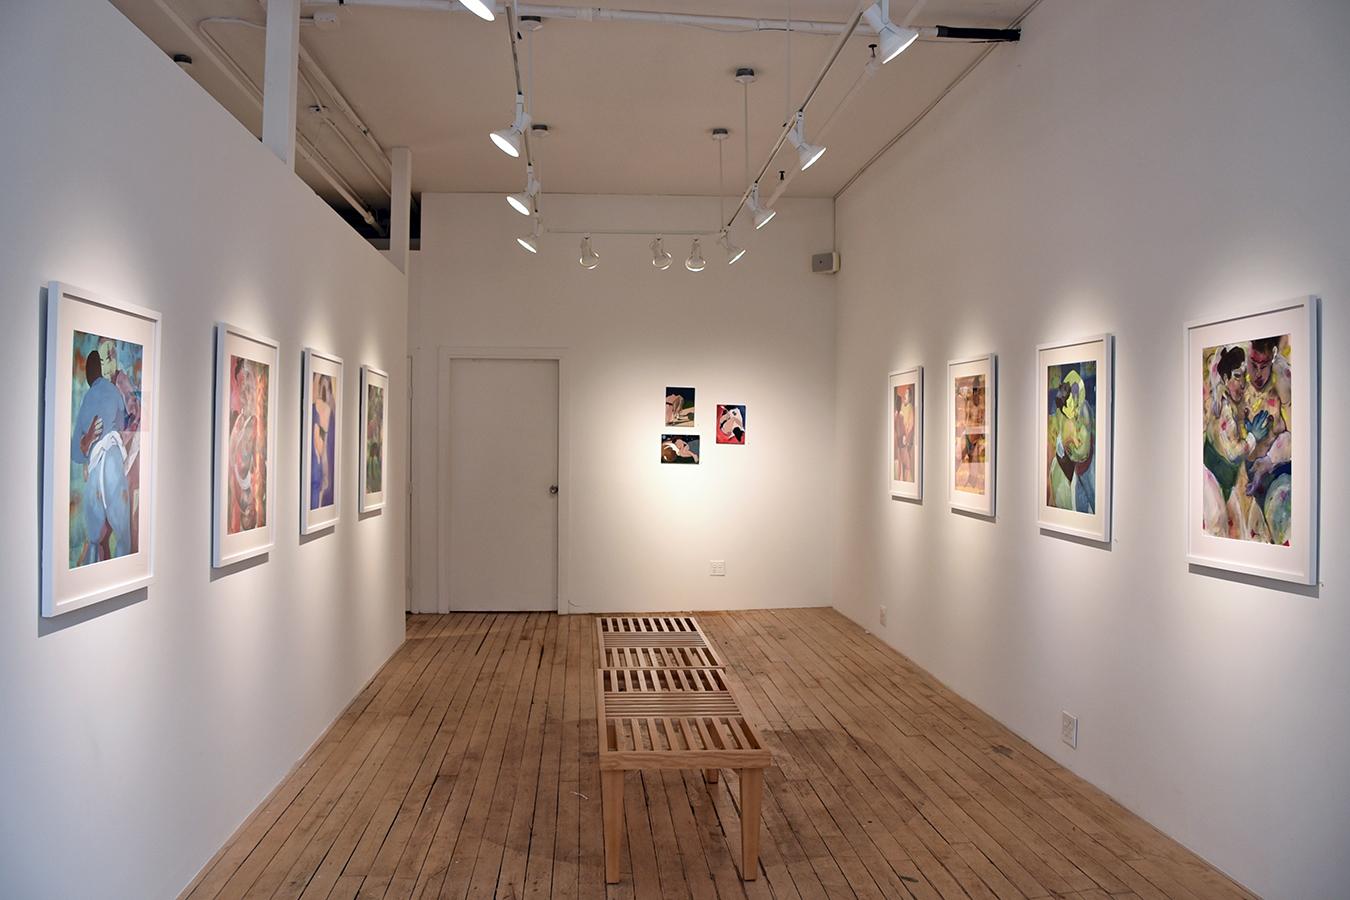 August 8 – September 4, 2019 - On the Surface: A Ceramics ShowSkinOnSkin: Barbara HerzfeldOn the Wall: Sue Koch